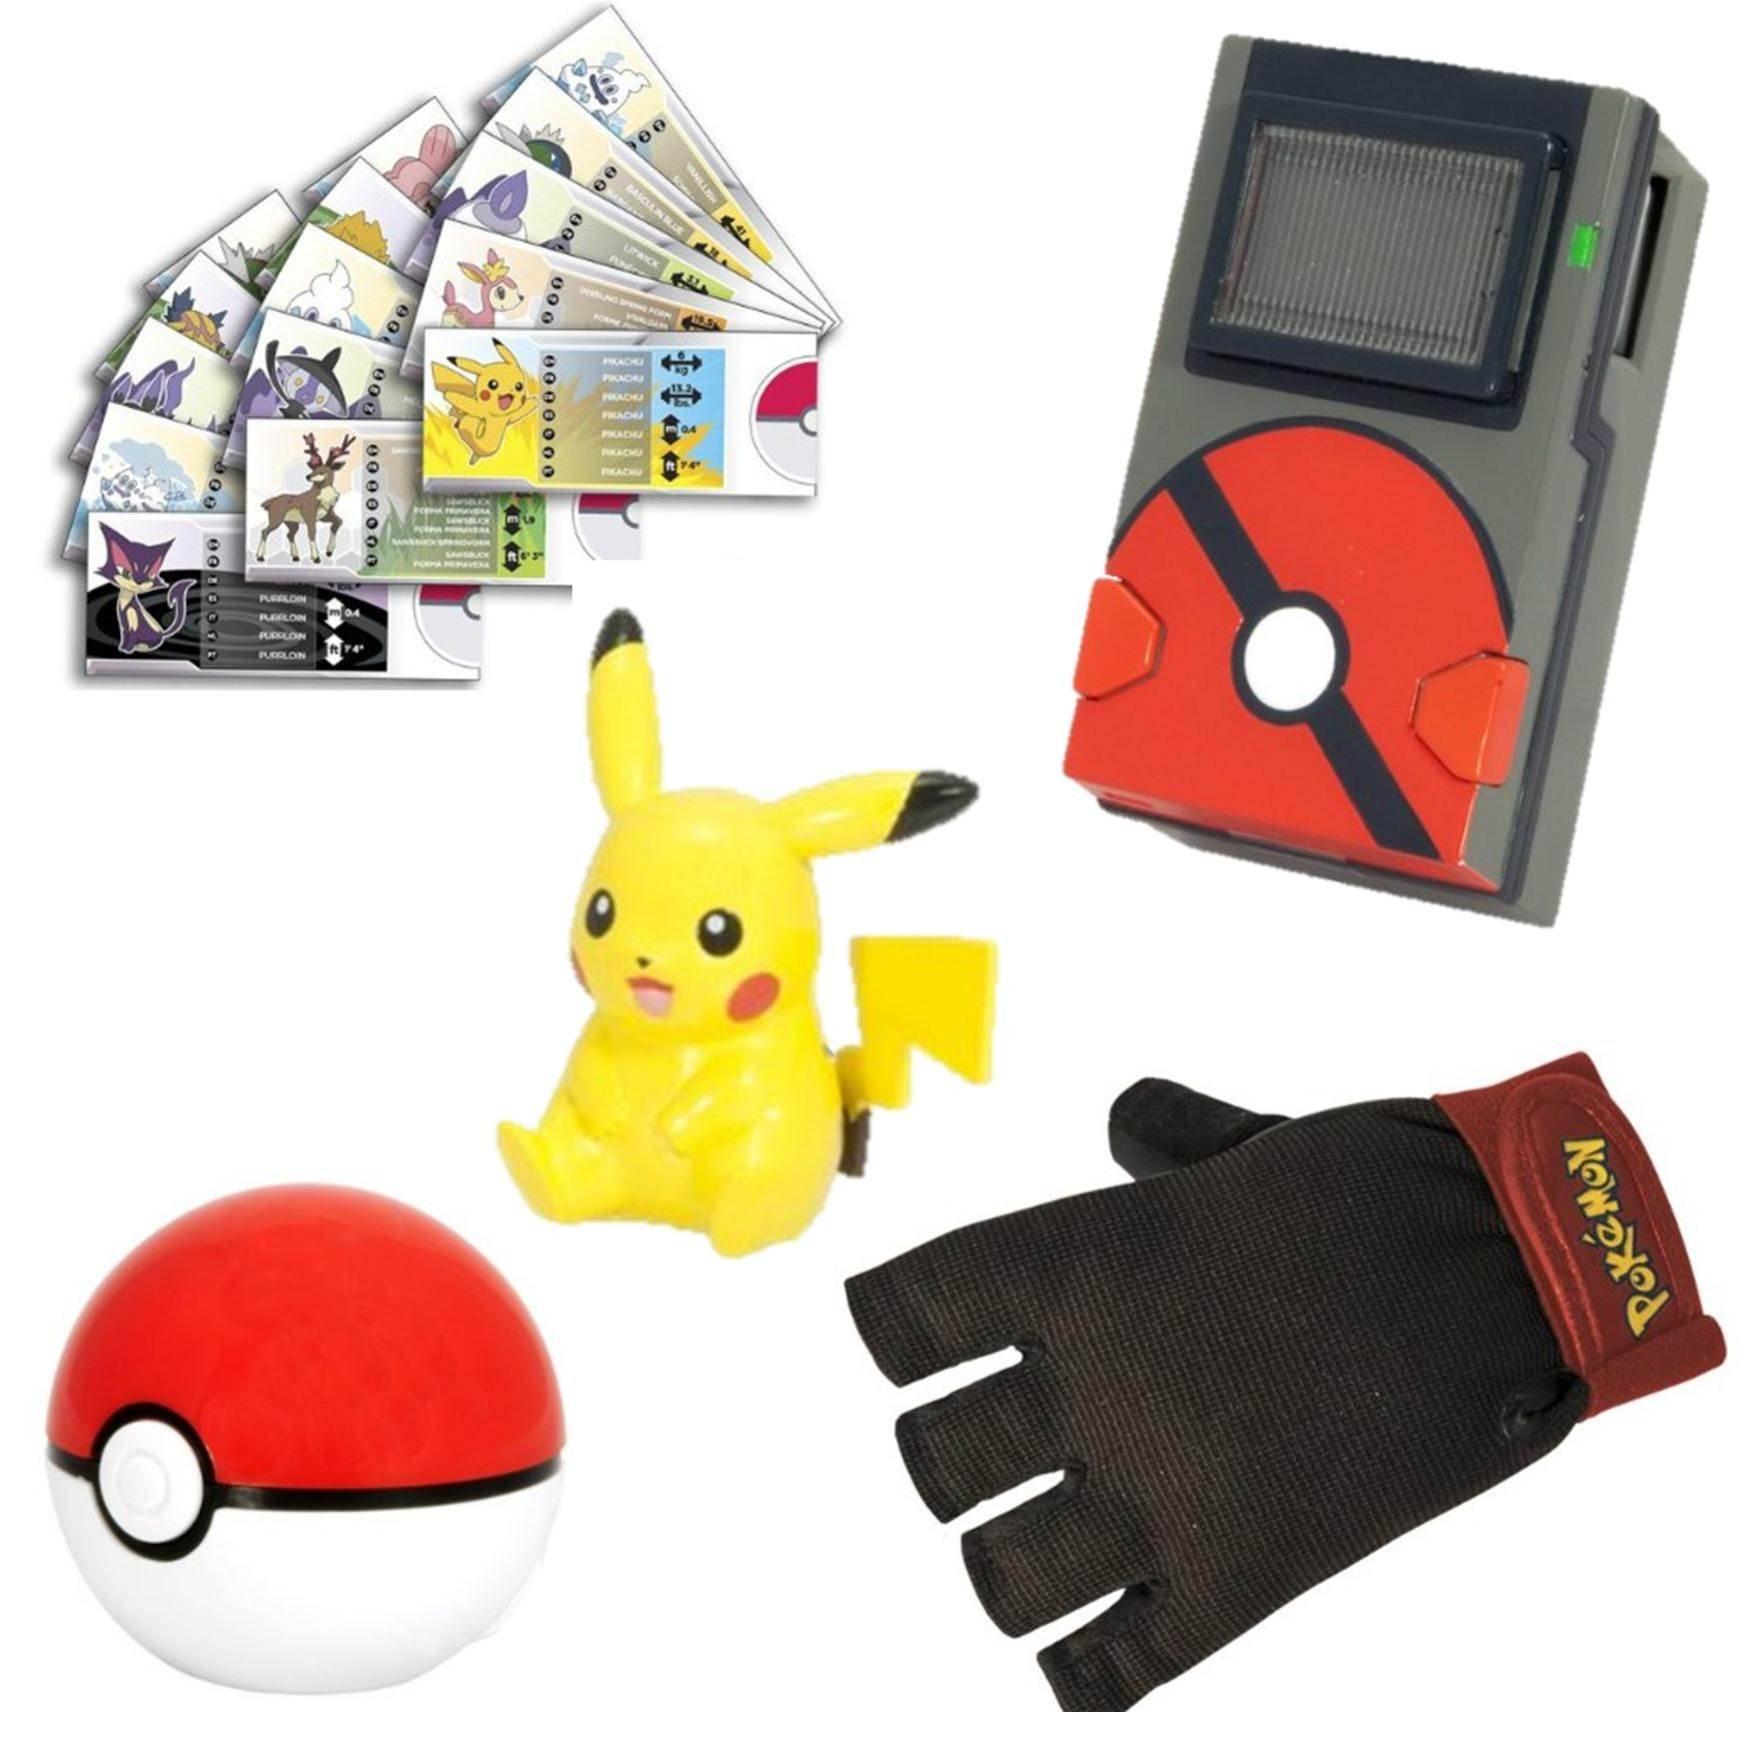 TOMY Pokémon Pokedex Trainer Kit (Discontinued by manufacturer)